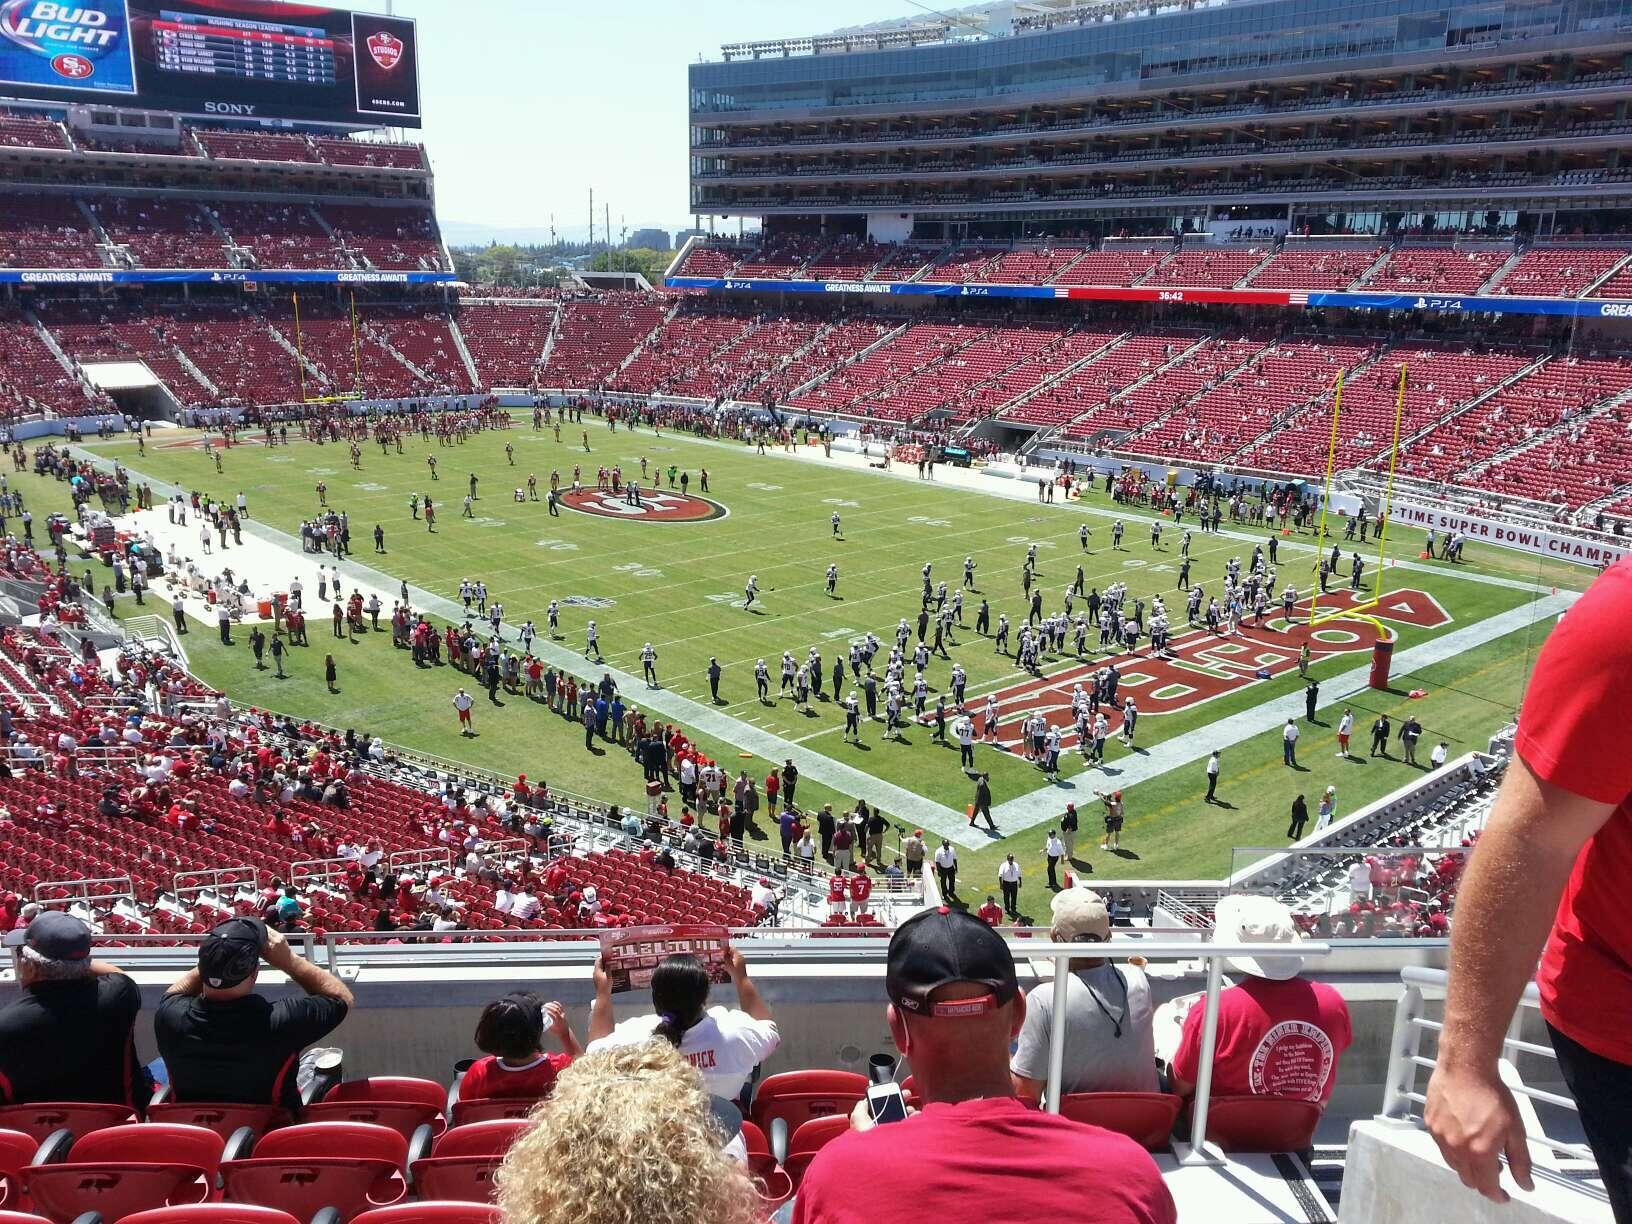 Levi S Stadium Section 208 Row 6 Seat 5 San Francisco